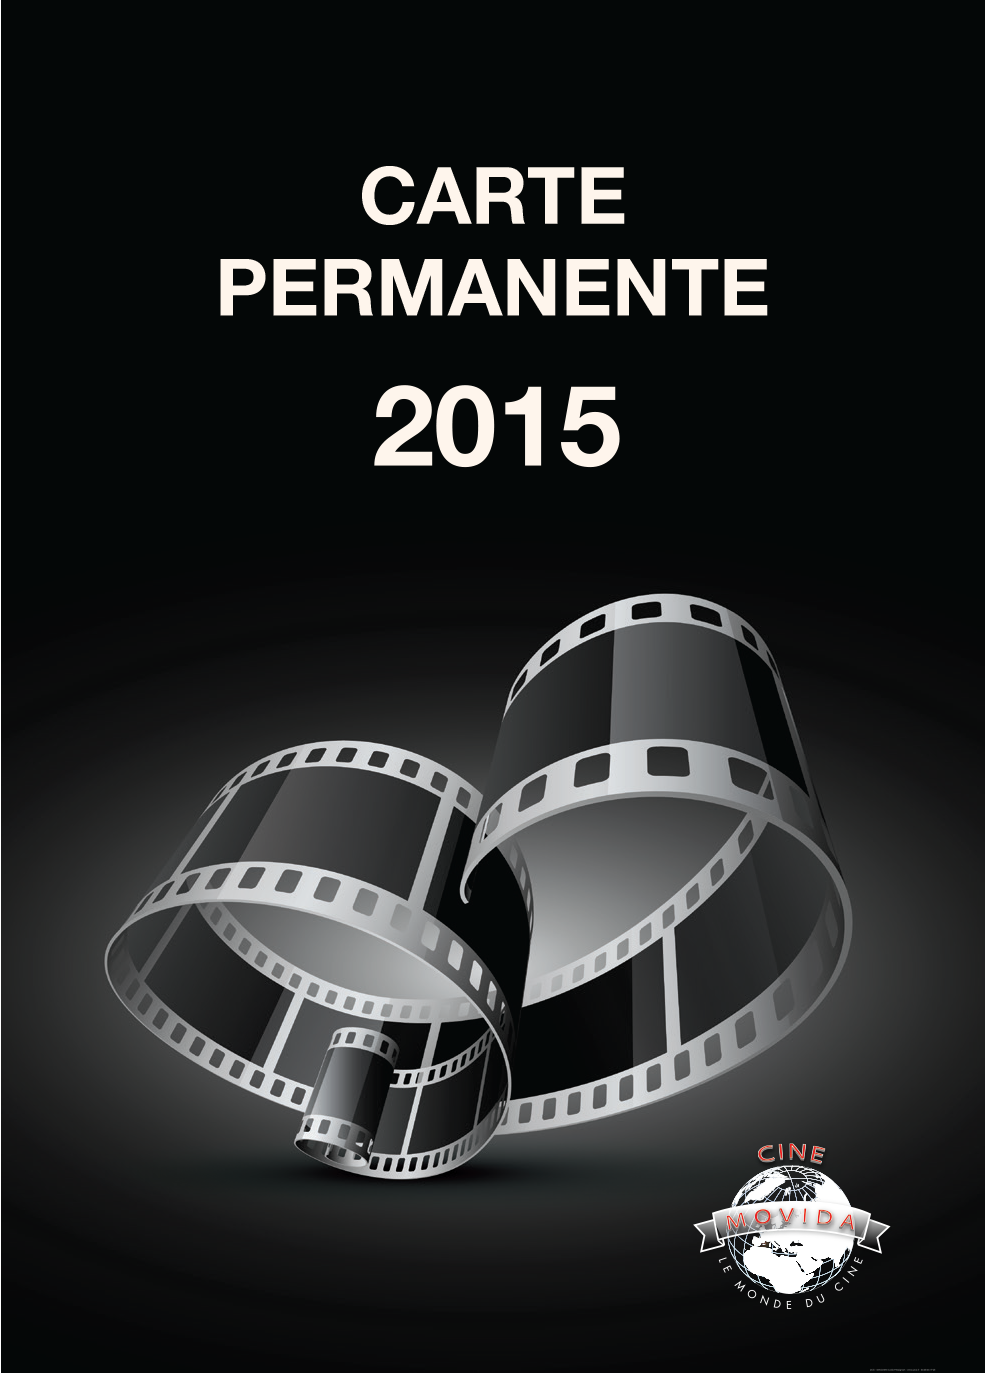 carte_permanente_2015-72